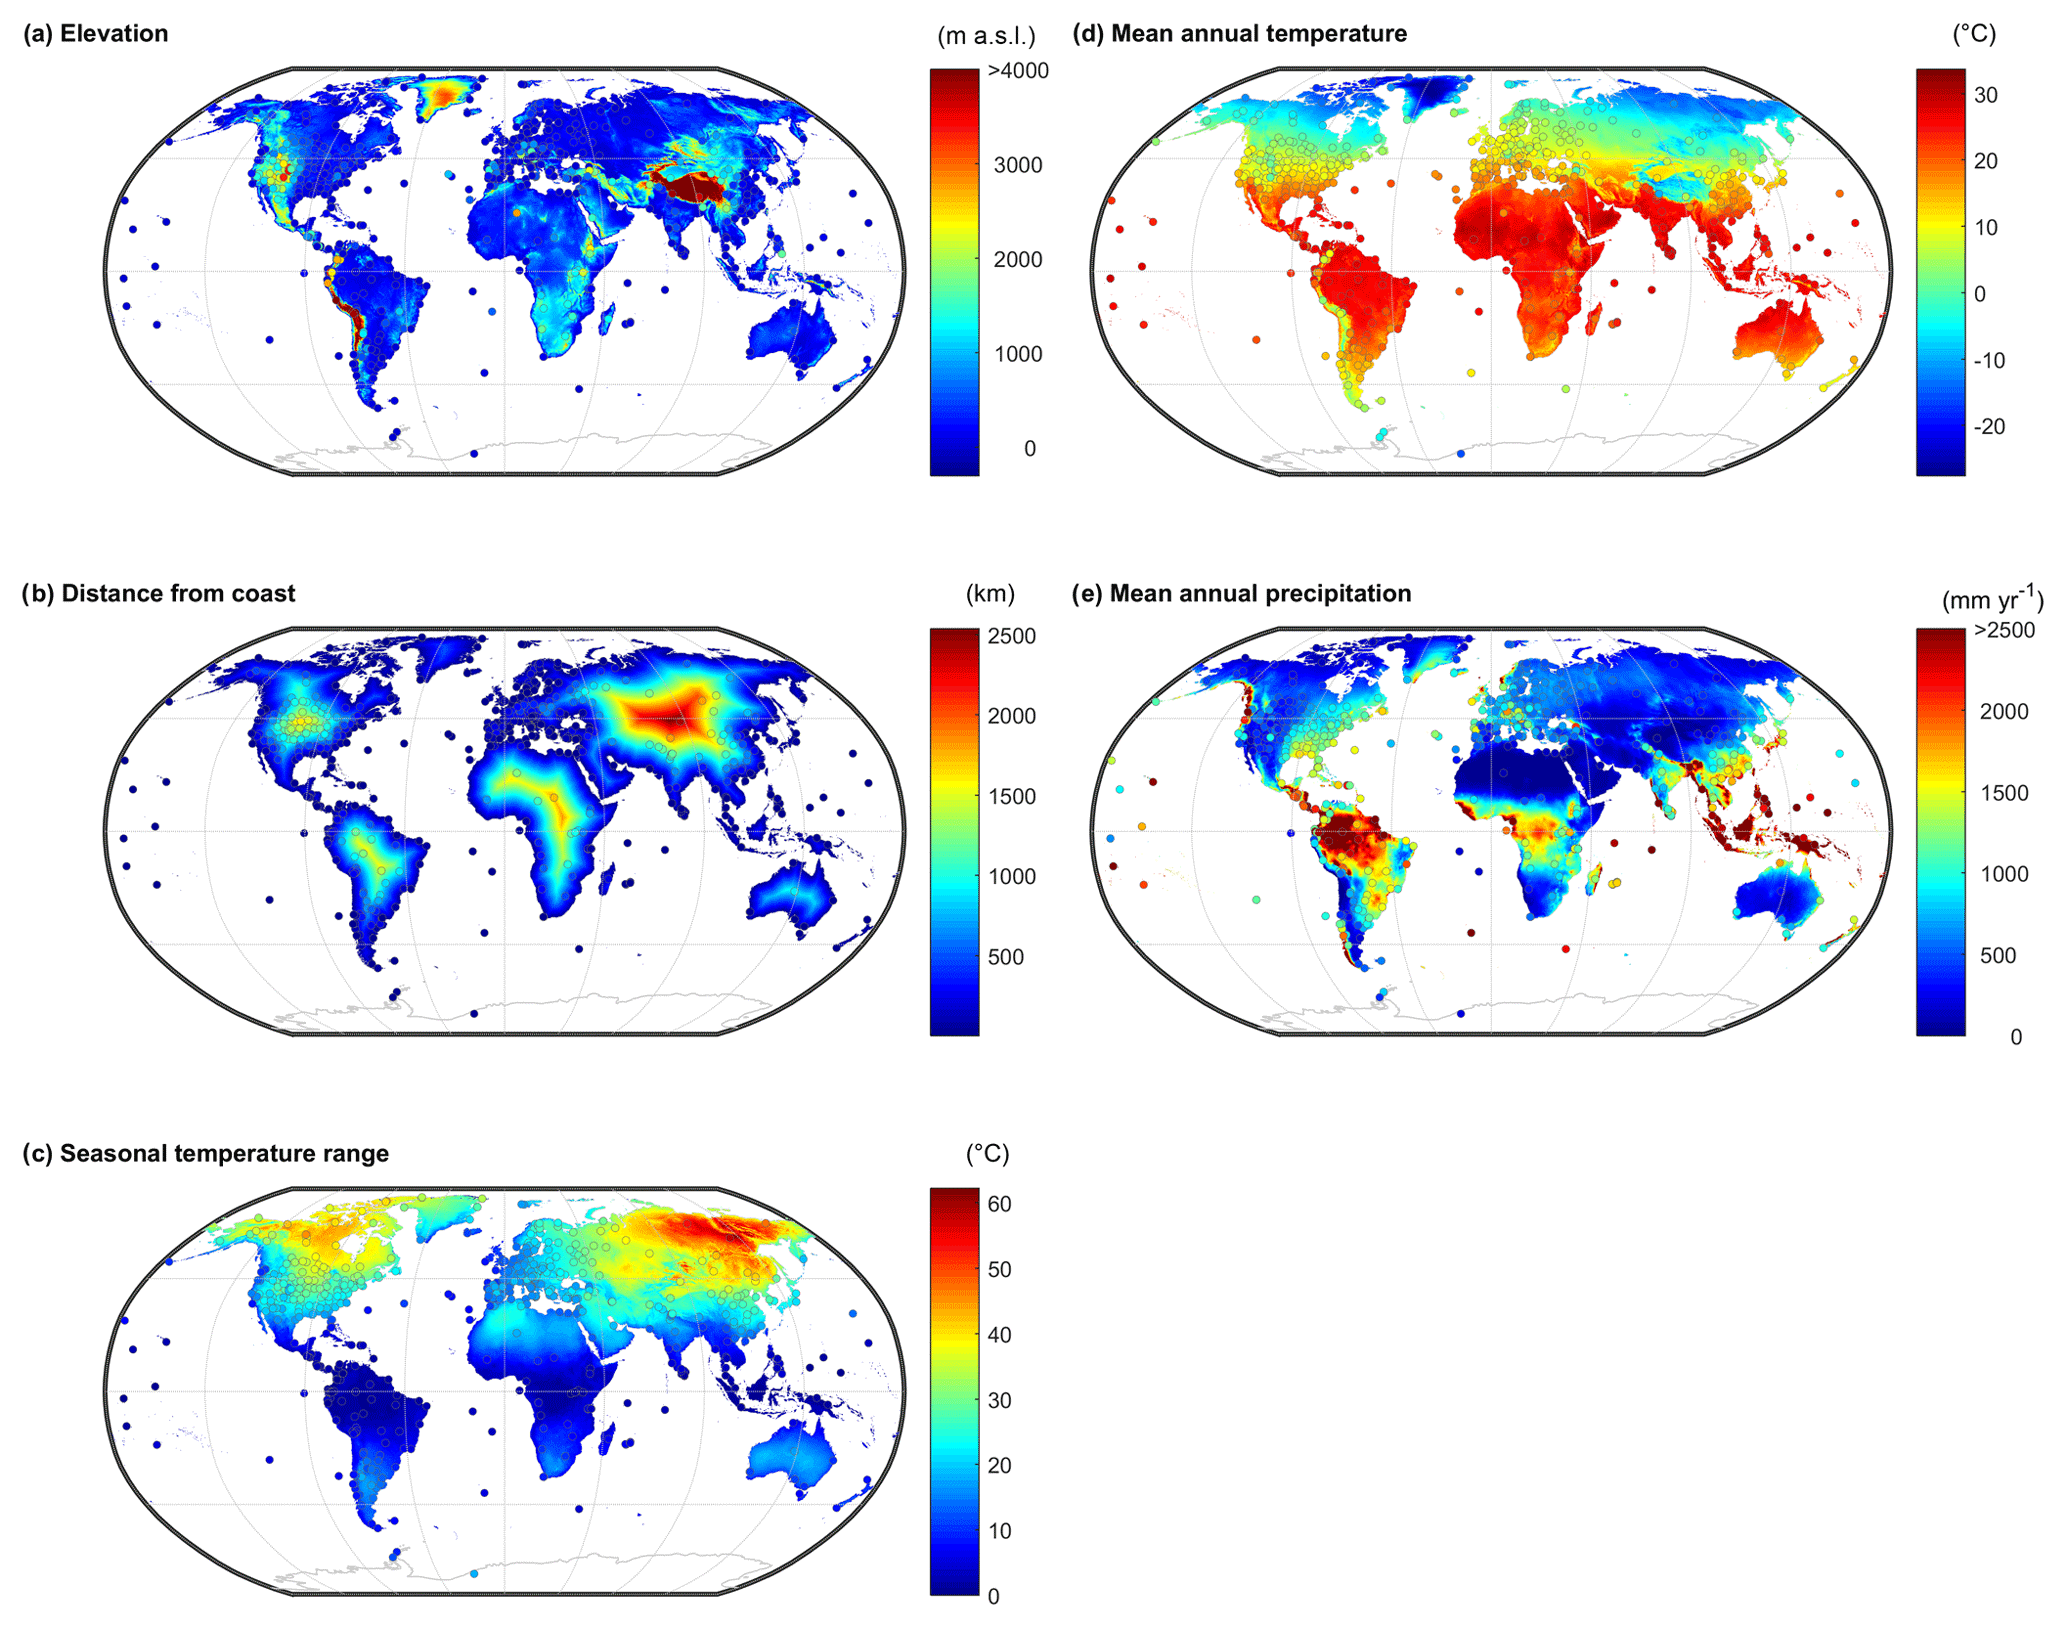 HESS - Global sinusoidal seasonality in precipitation isotopes